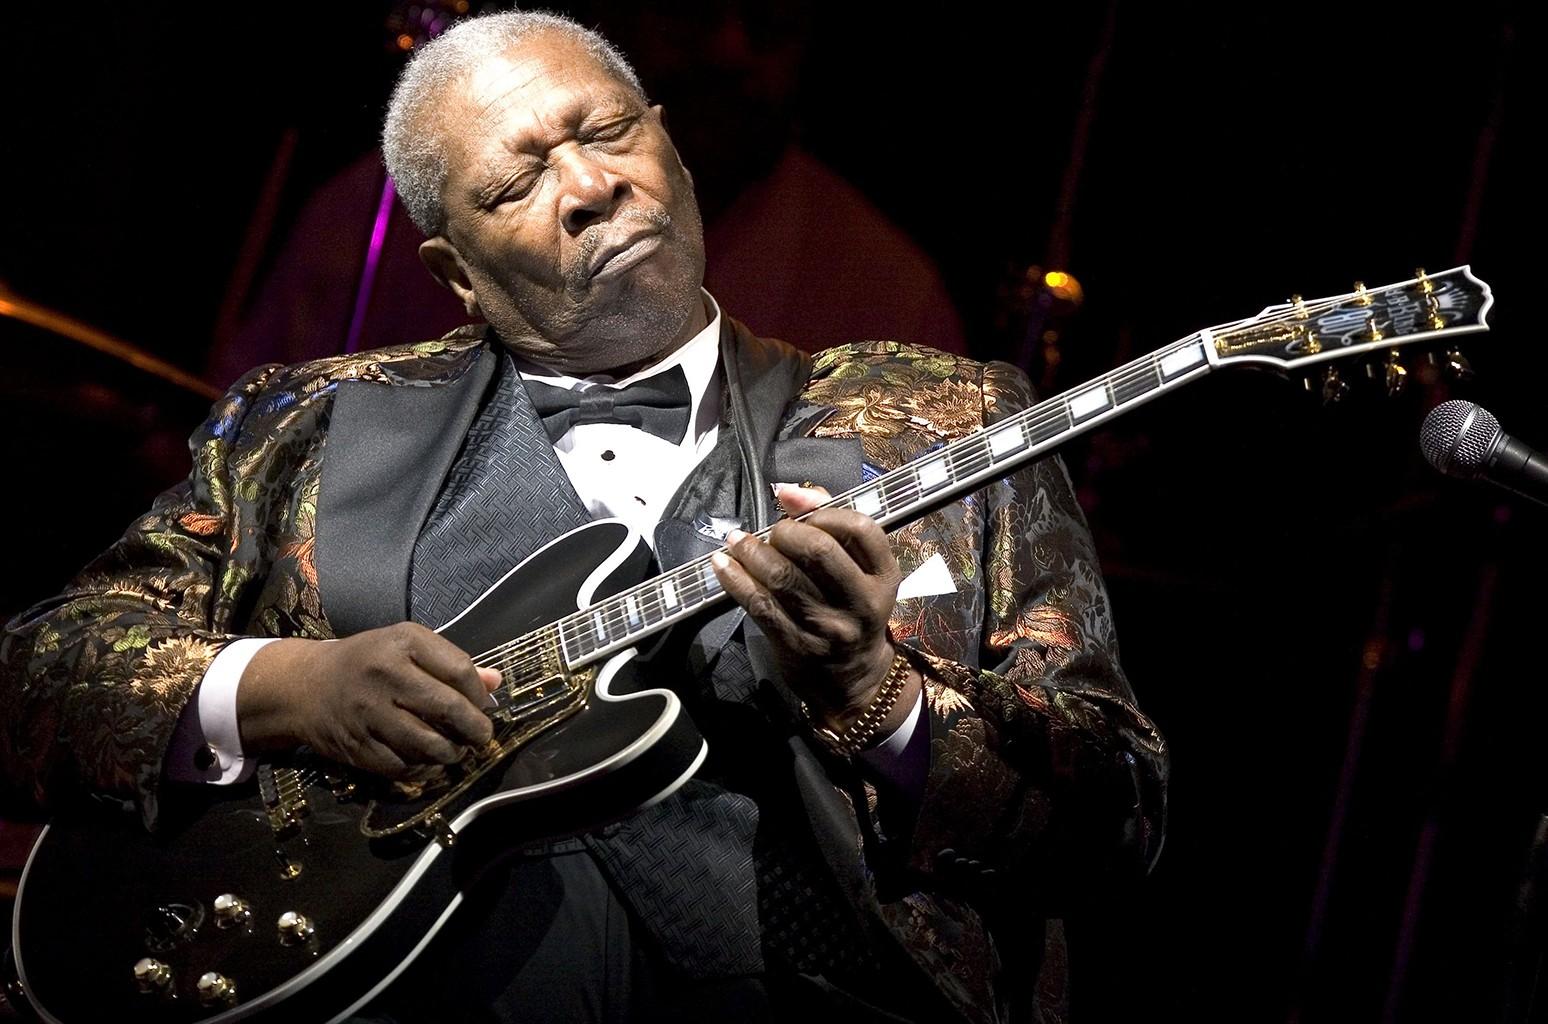 B.B. King performs at B.B. King Blues Club & Grill